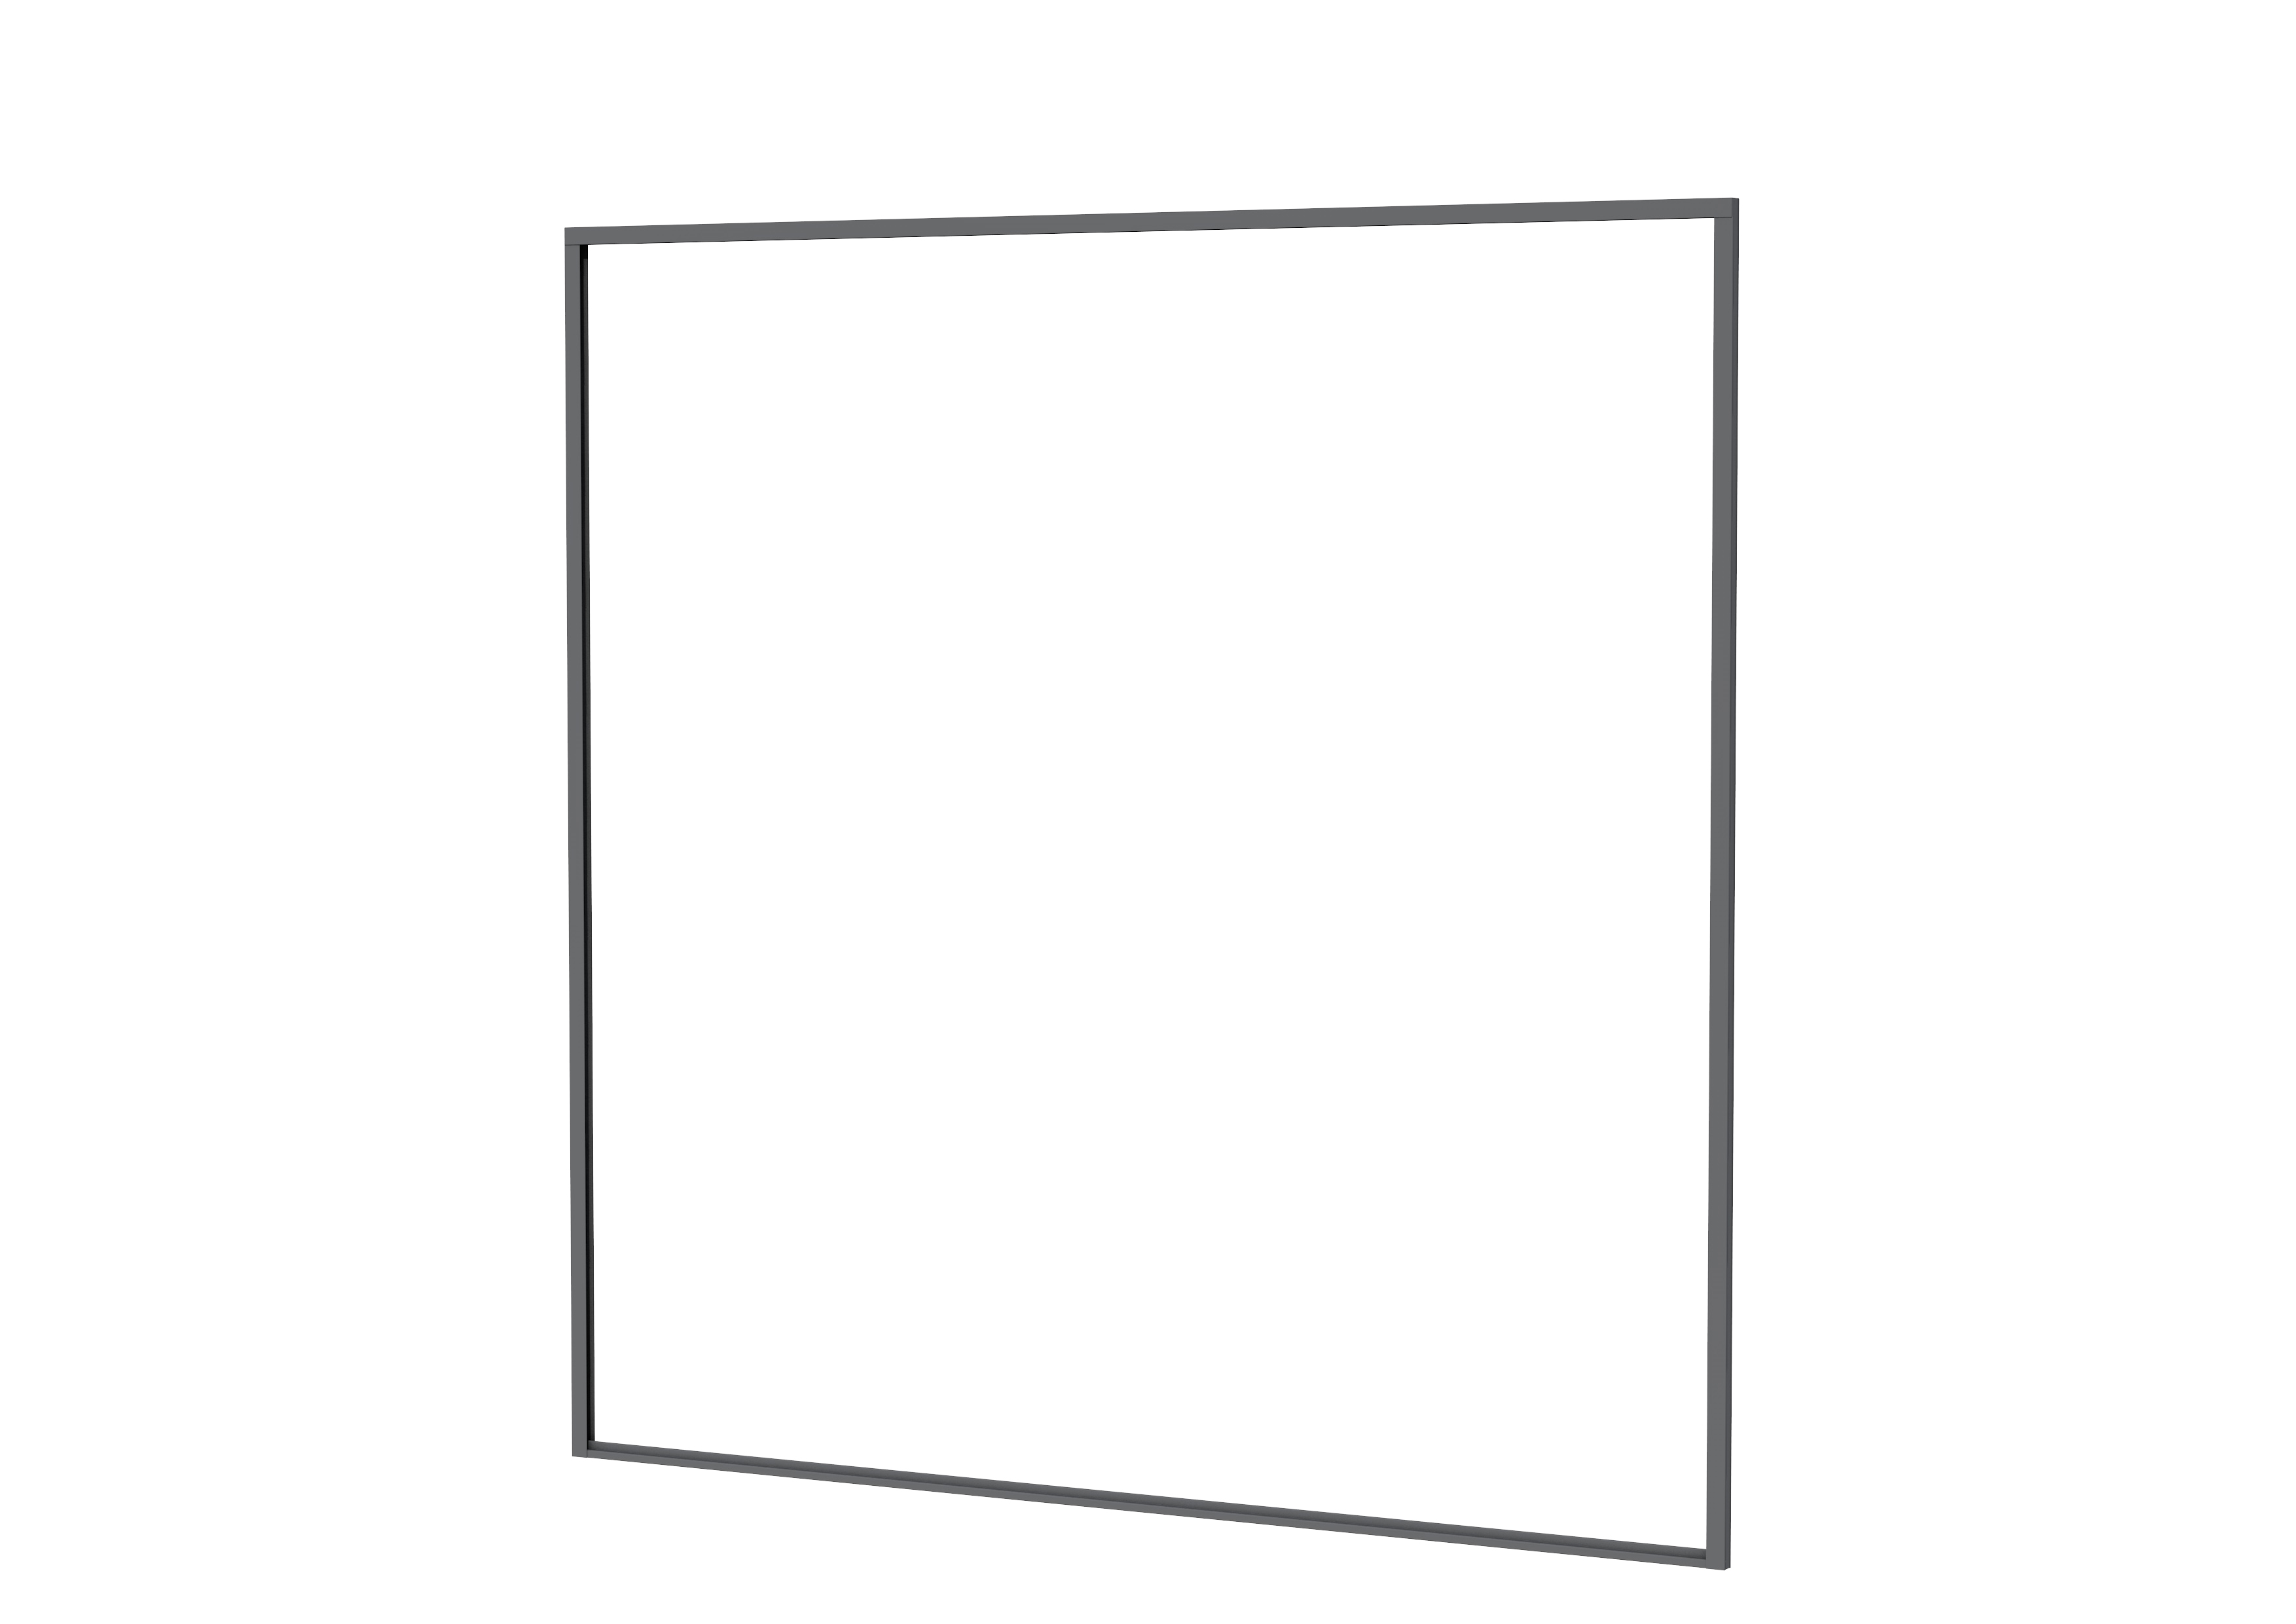 Woodvision | Profielenset tbv Composiet schutting | 181.5 x 200 cm